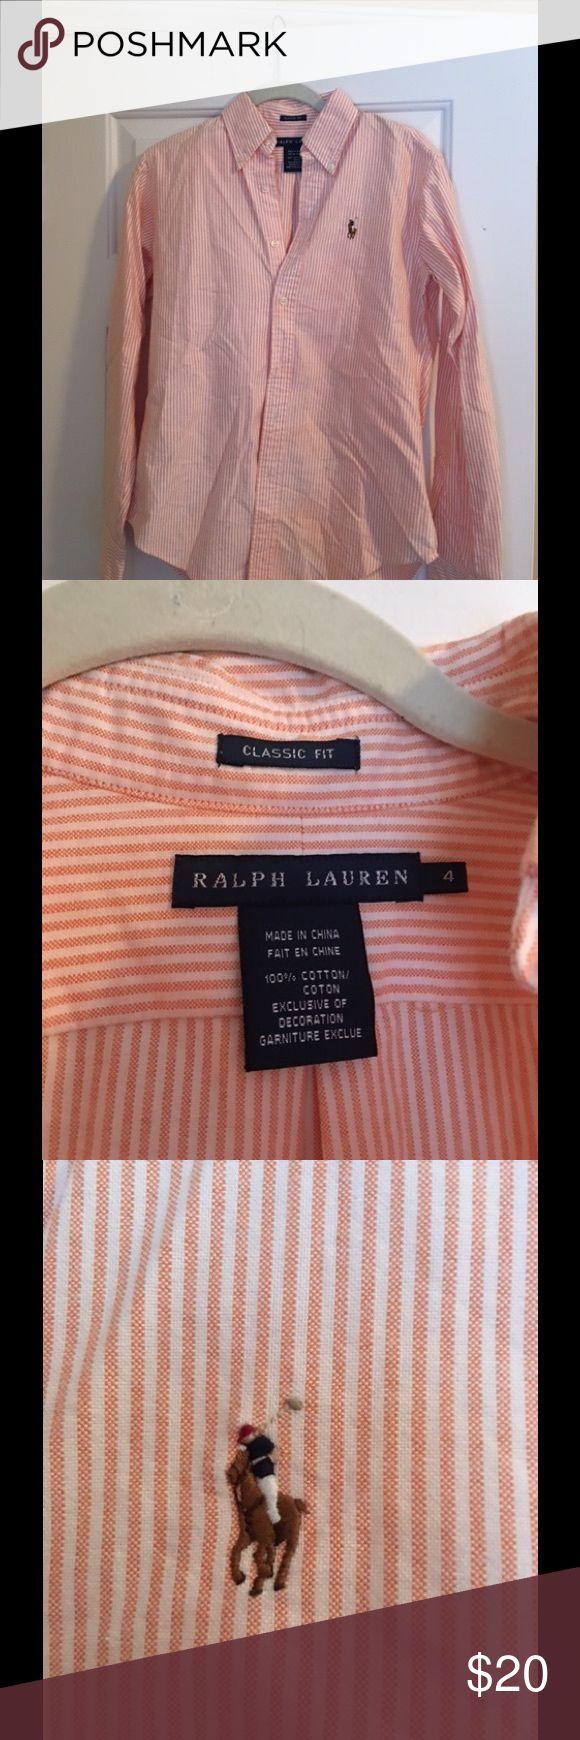 Ralph Lauren Oxford shirt Classic fit size 4 Tops Button Down Shirts